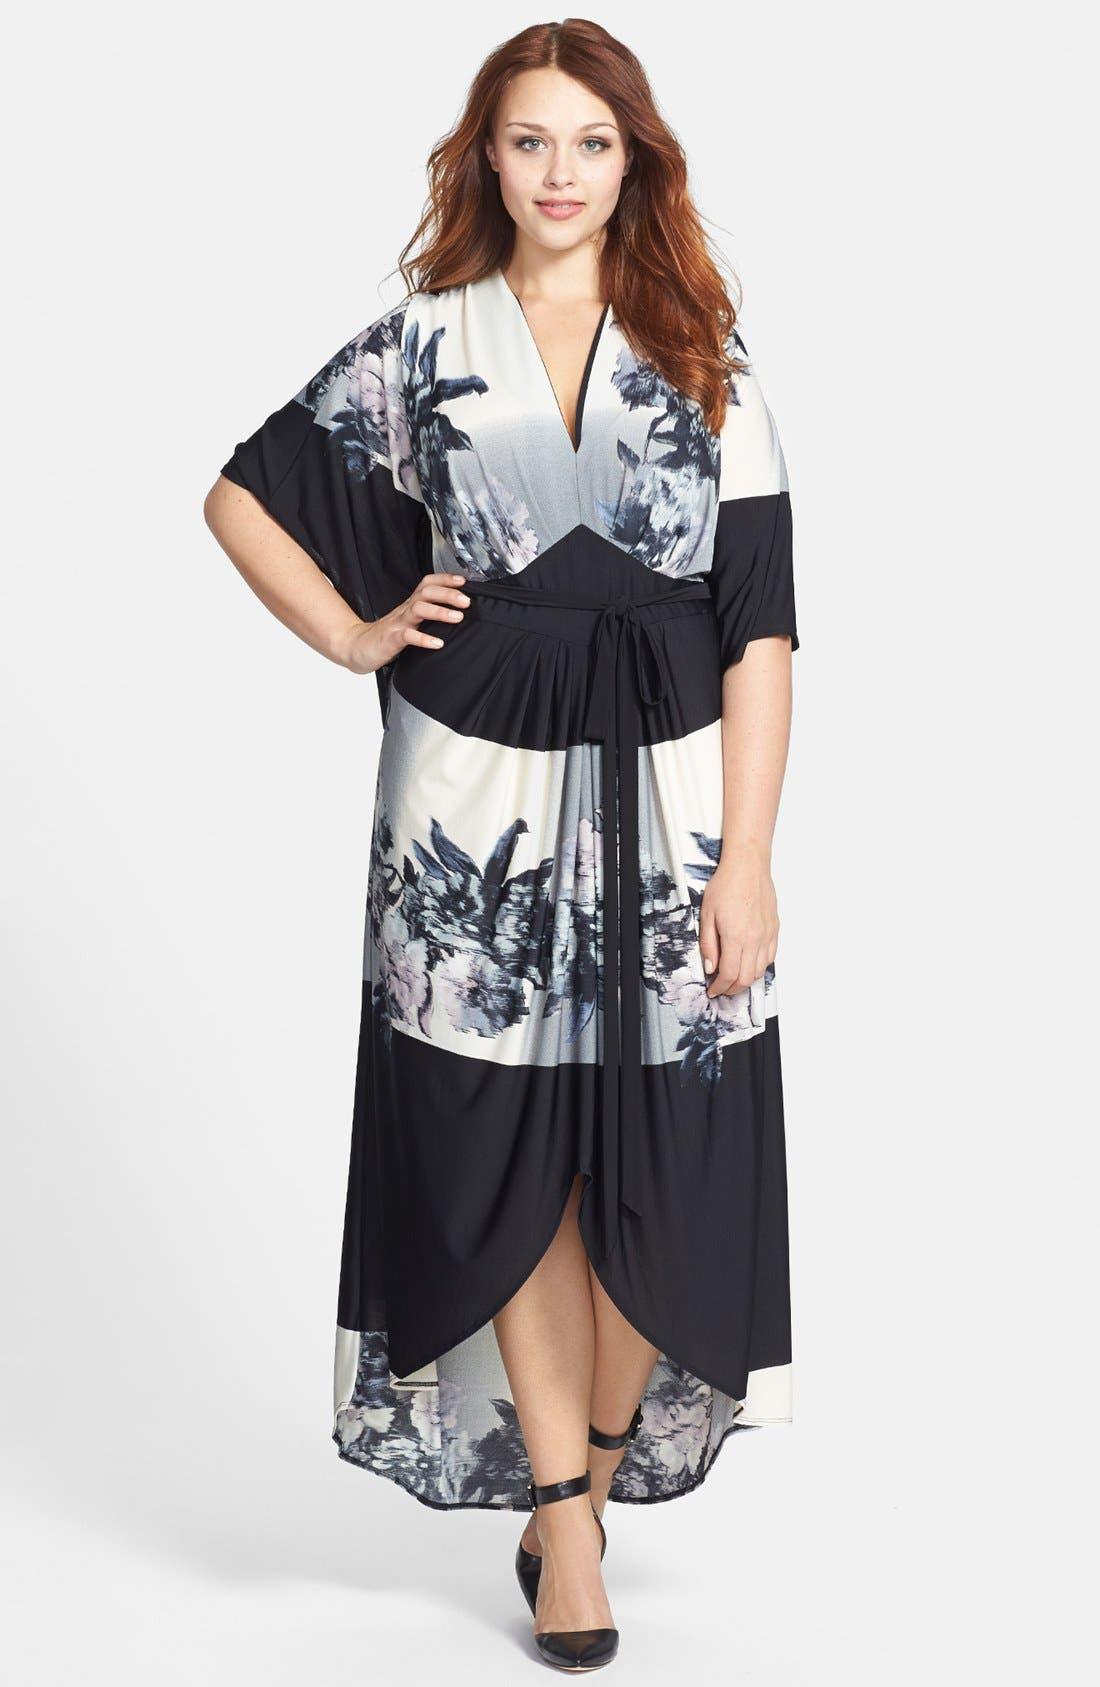 Main Image - ABS by Allen Schwartz 'Kaftan' Printed High/Low Maxi Dress (Plus Size)